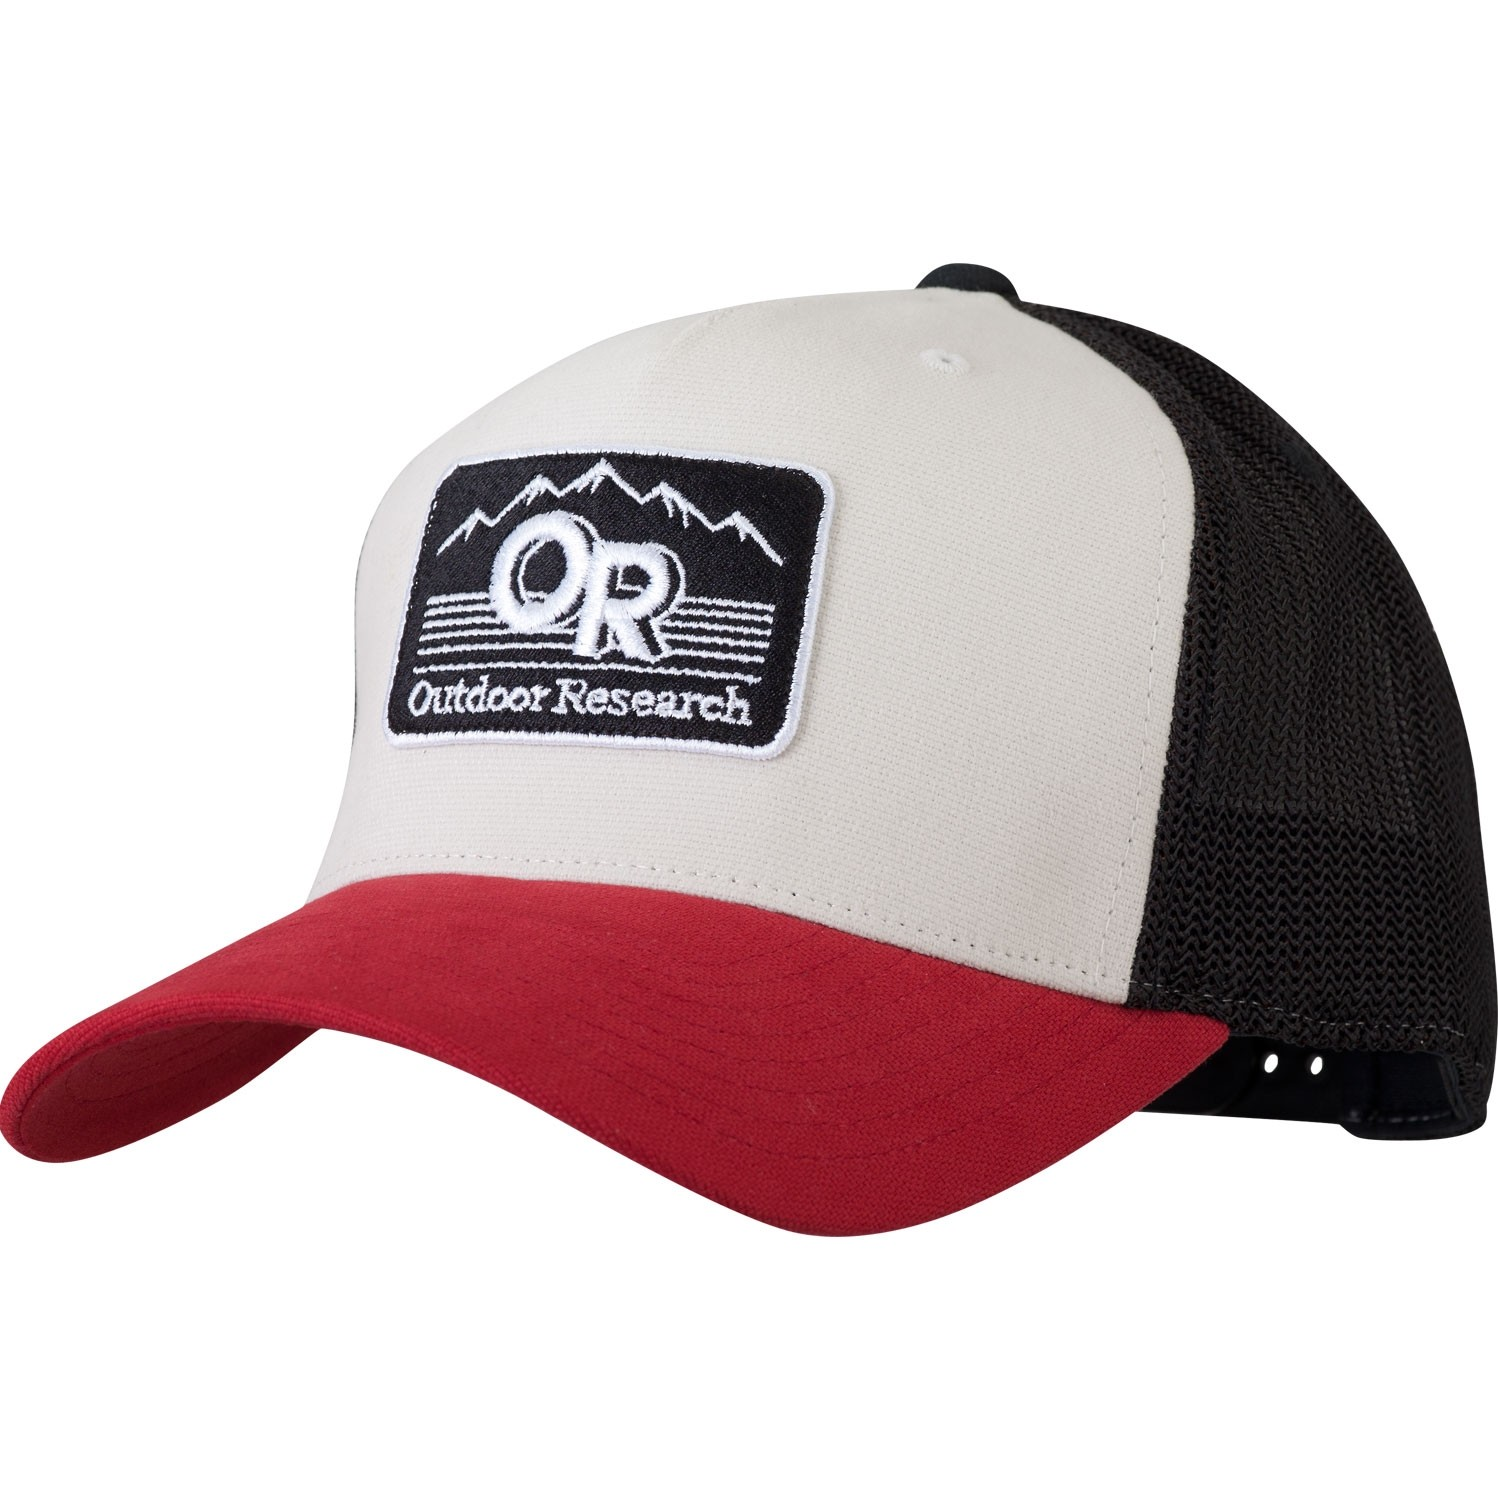 Outdoor Research Advocate Cap - Adobe